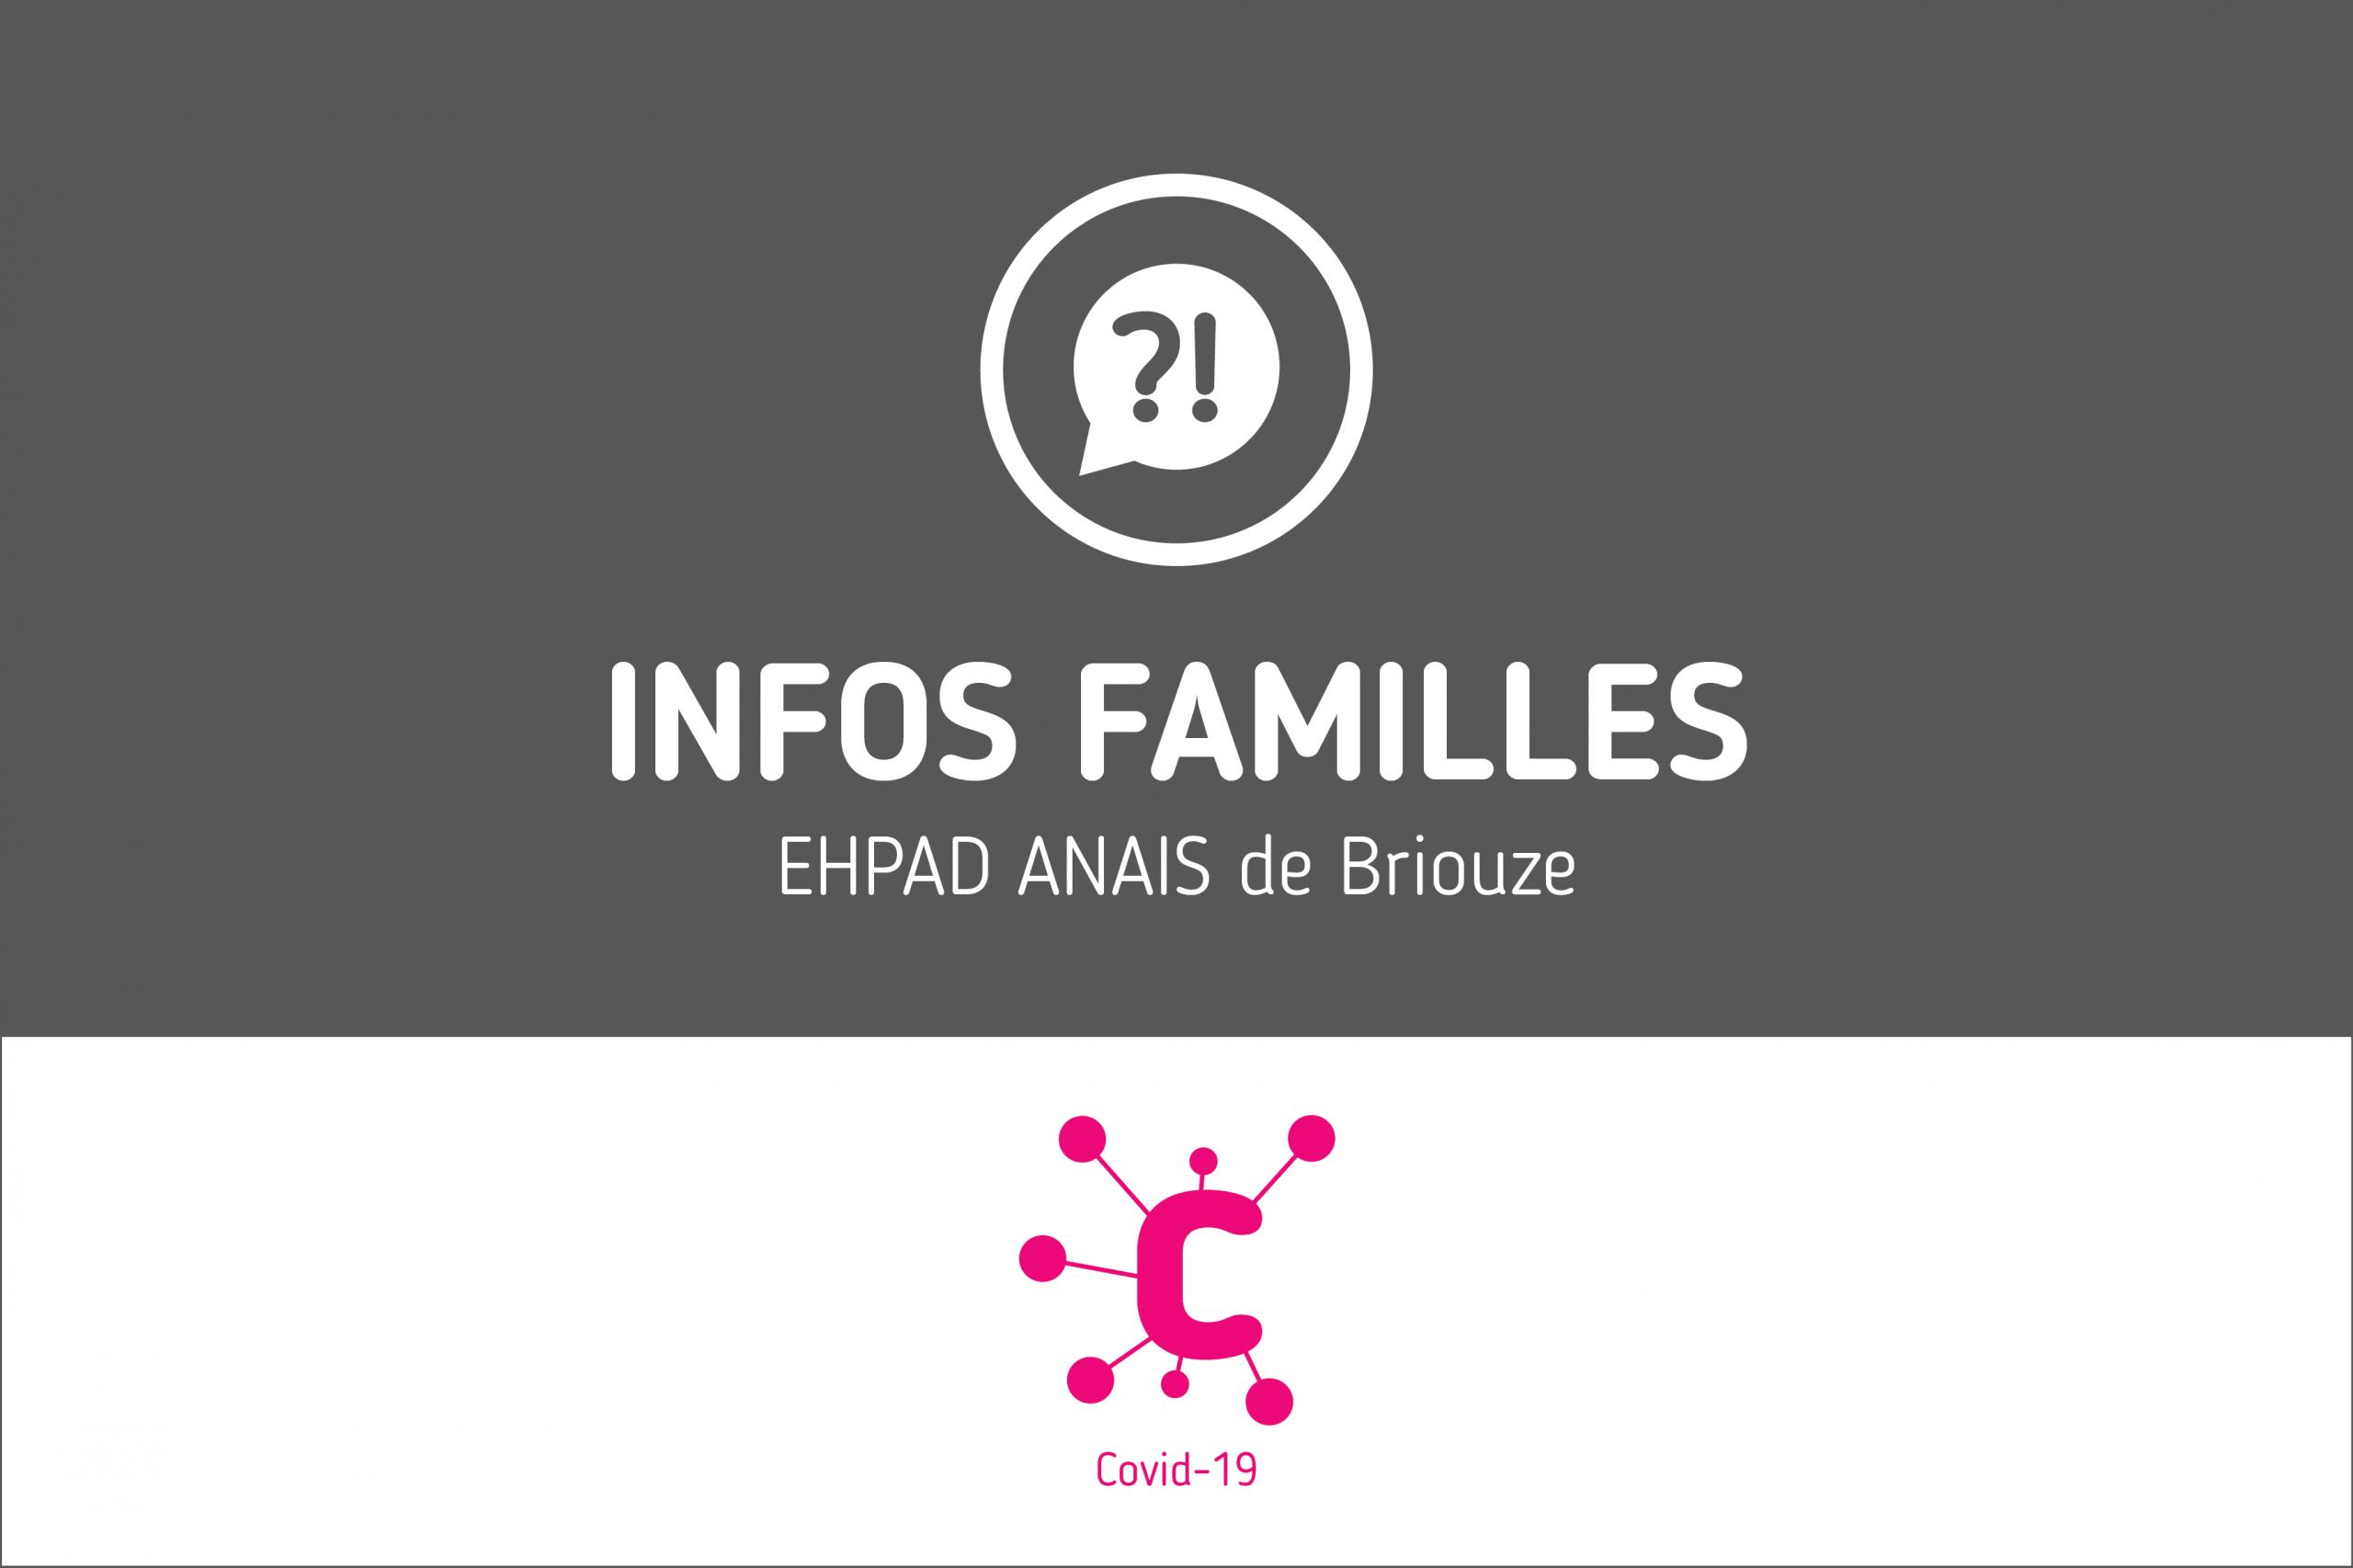 Protégé: Infos Familles – EHPAD ANAIS de Briouze